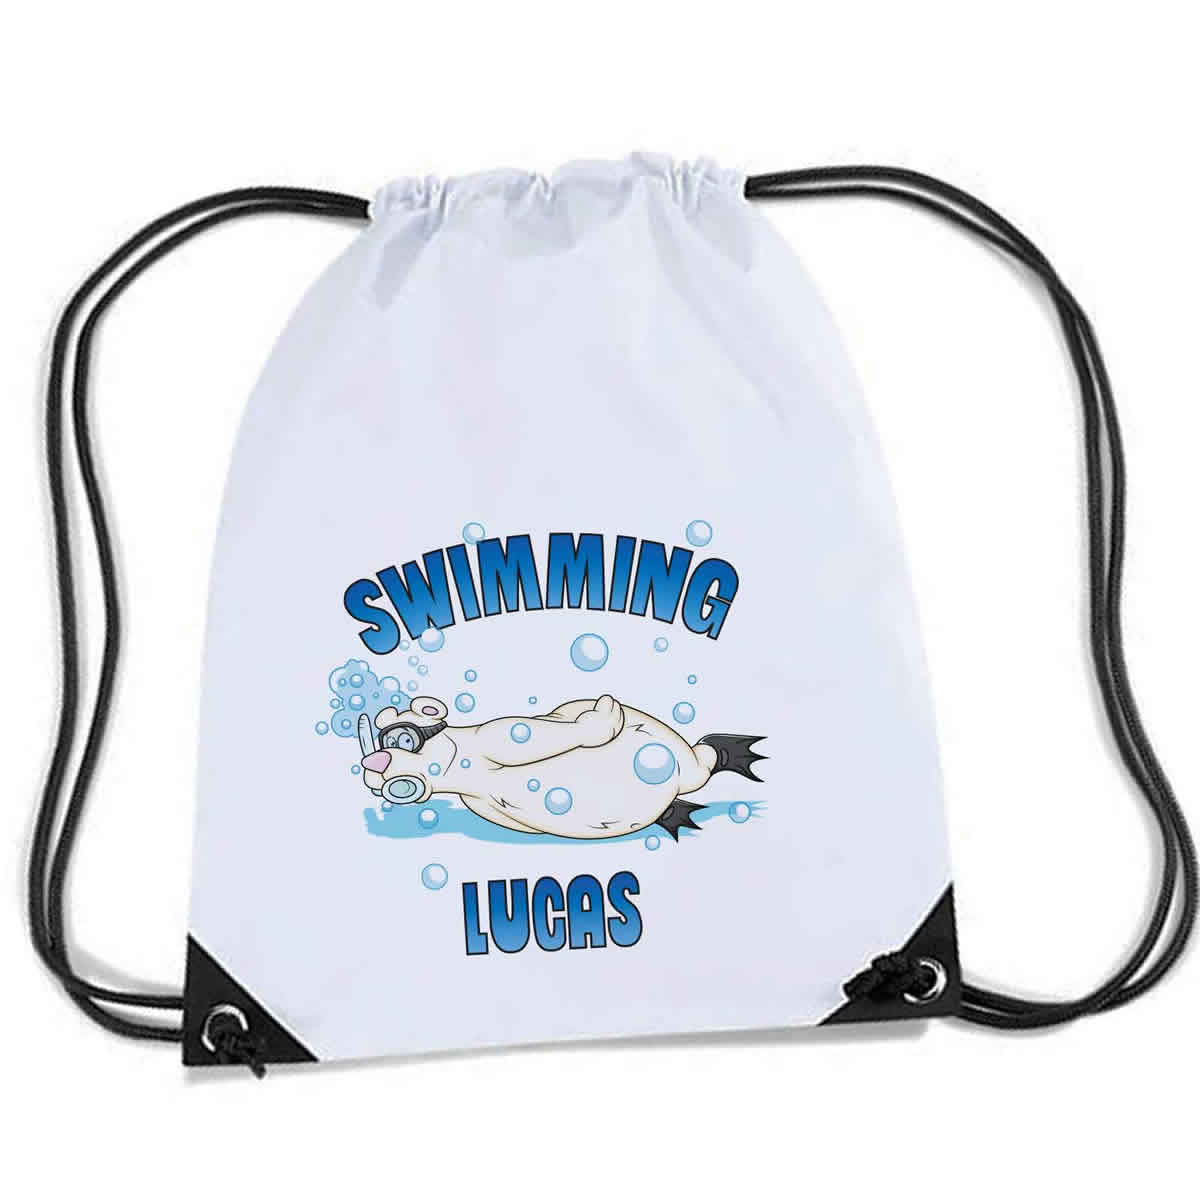 Personalised White Sports Nylon Drawstring Gym Bag Sack Pack Rope Polar Bear Swimming Cartoon Design